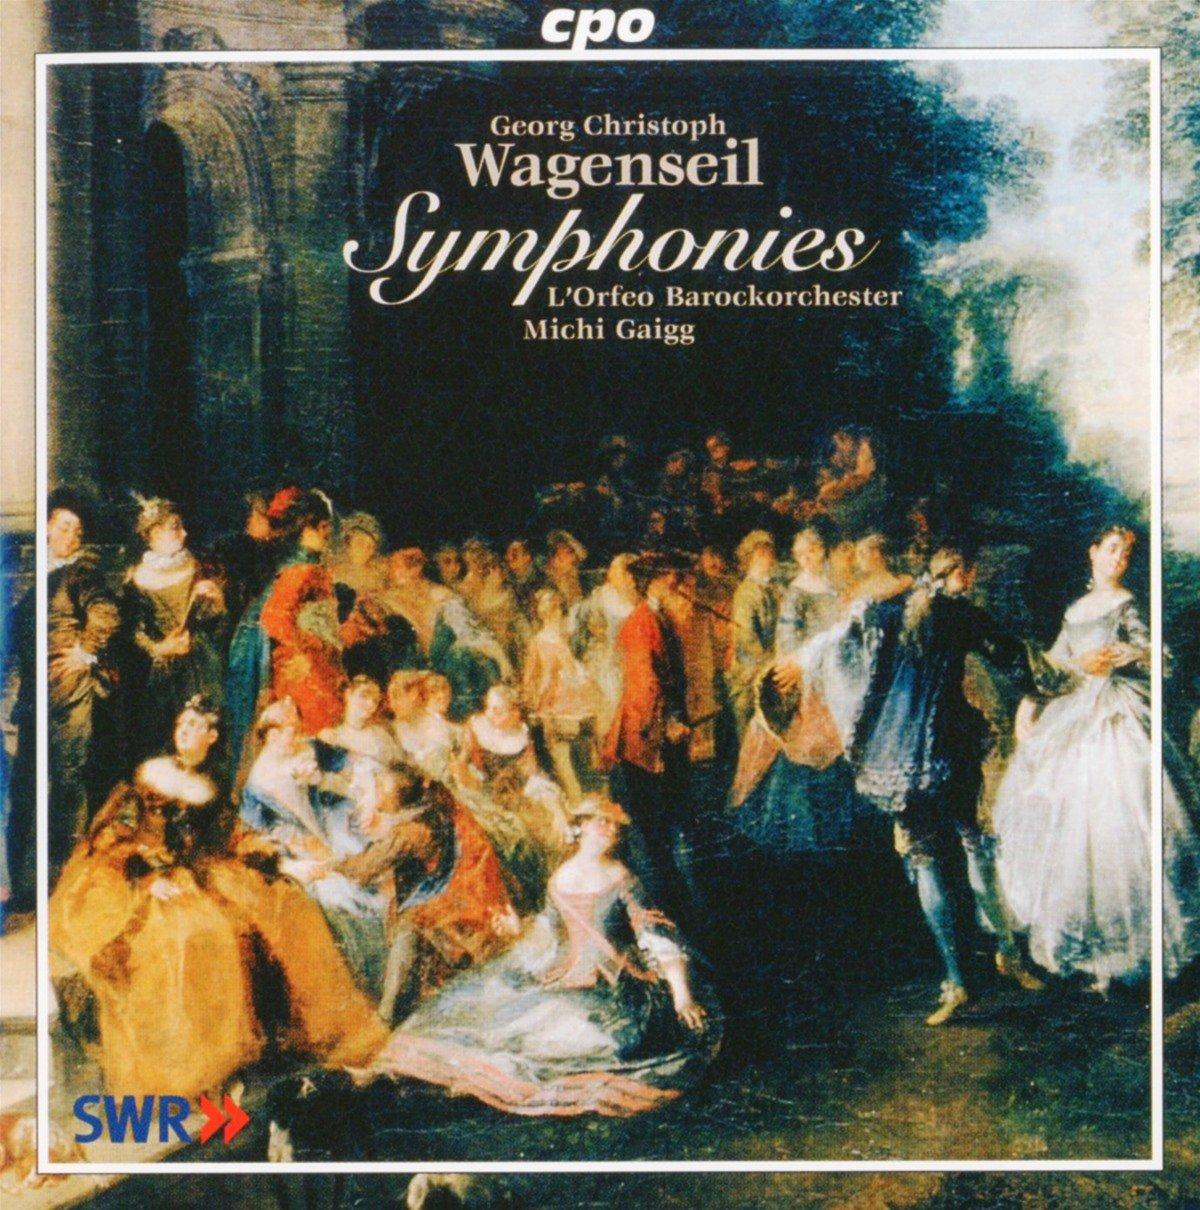 Georg Christoph Wagenseil, Michi Gaigg, Orfeo Baroque Orchestra ...